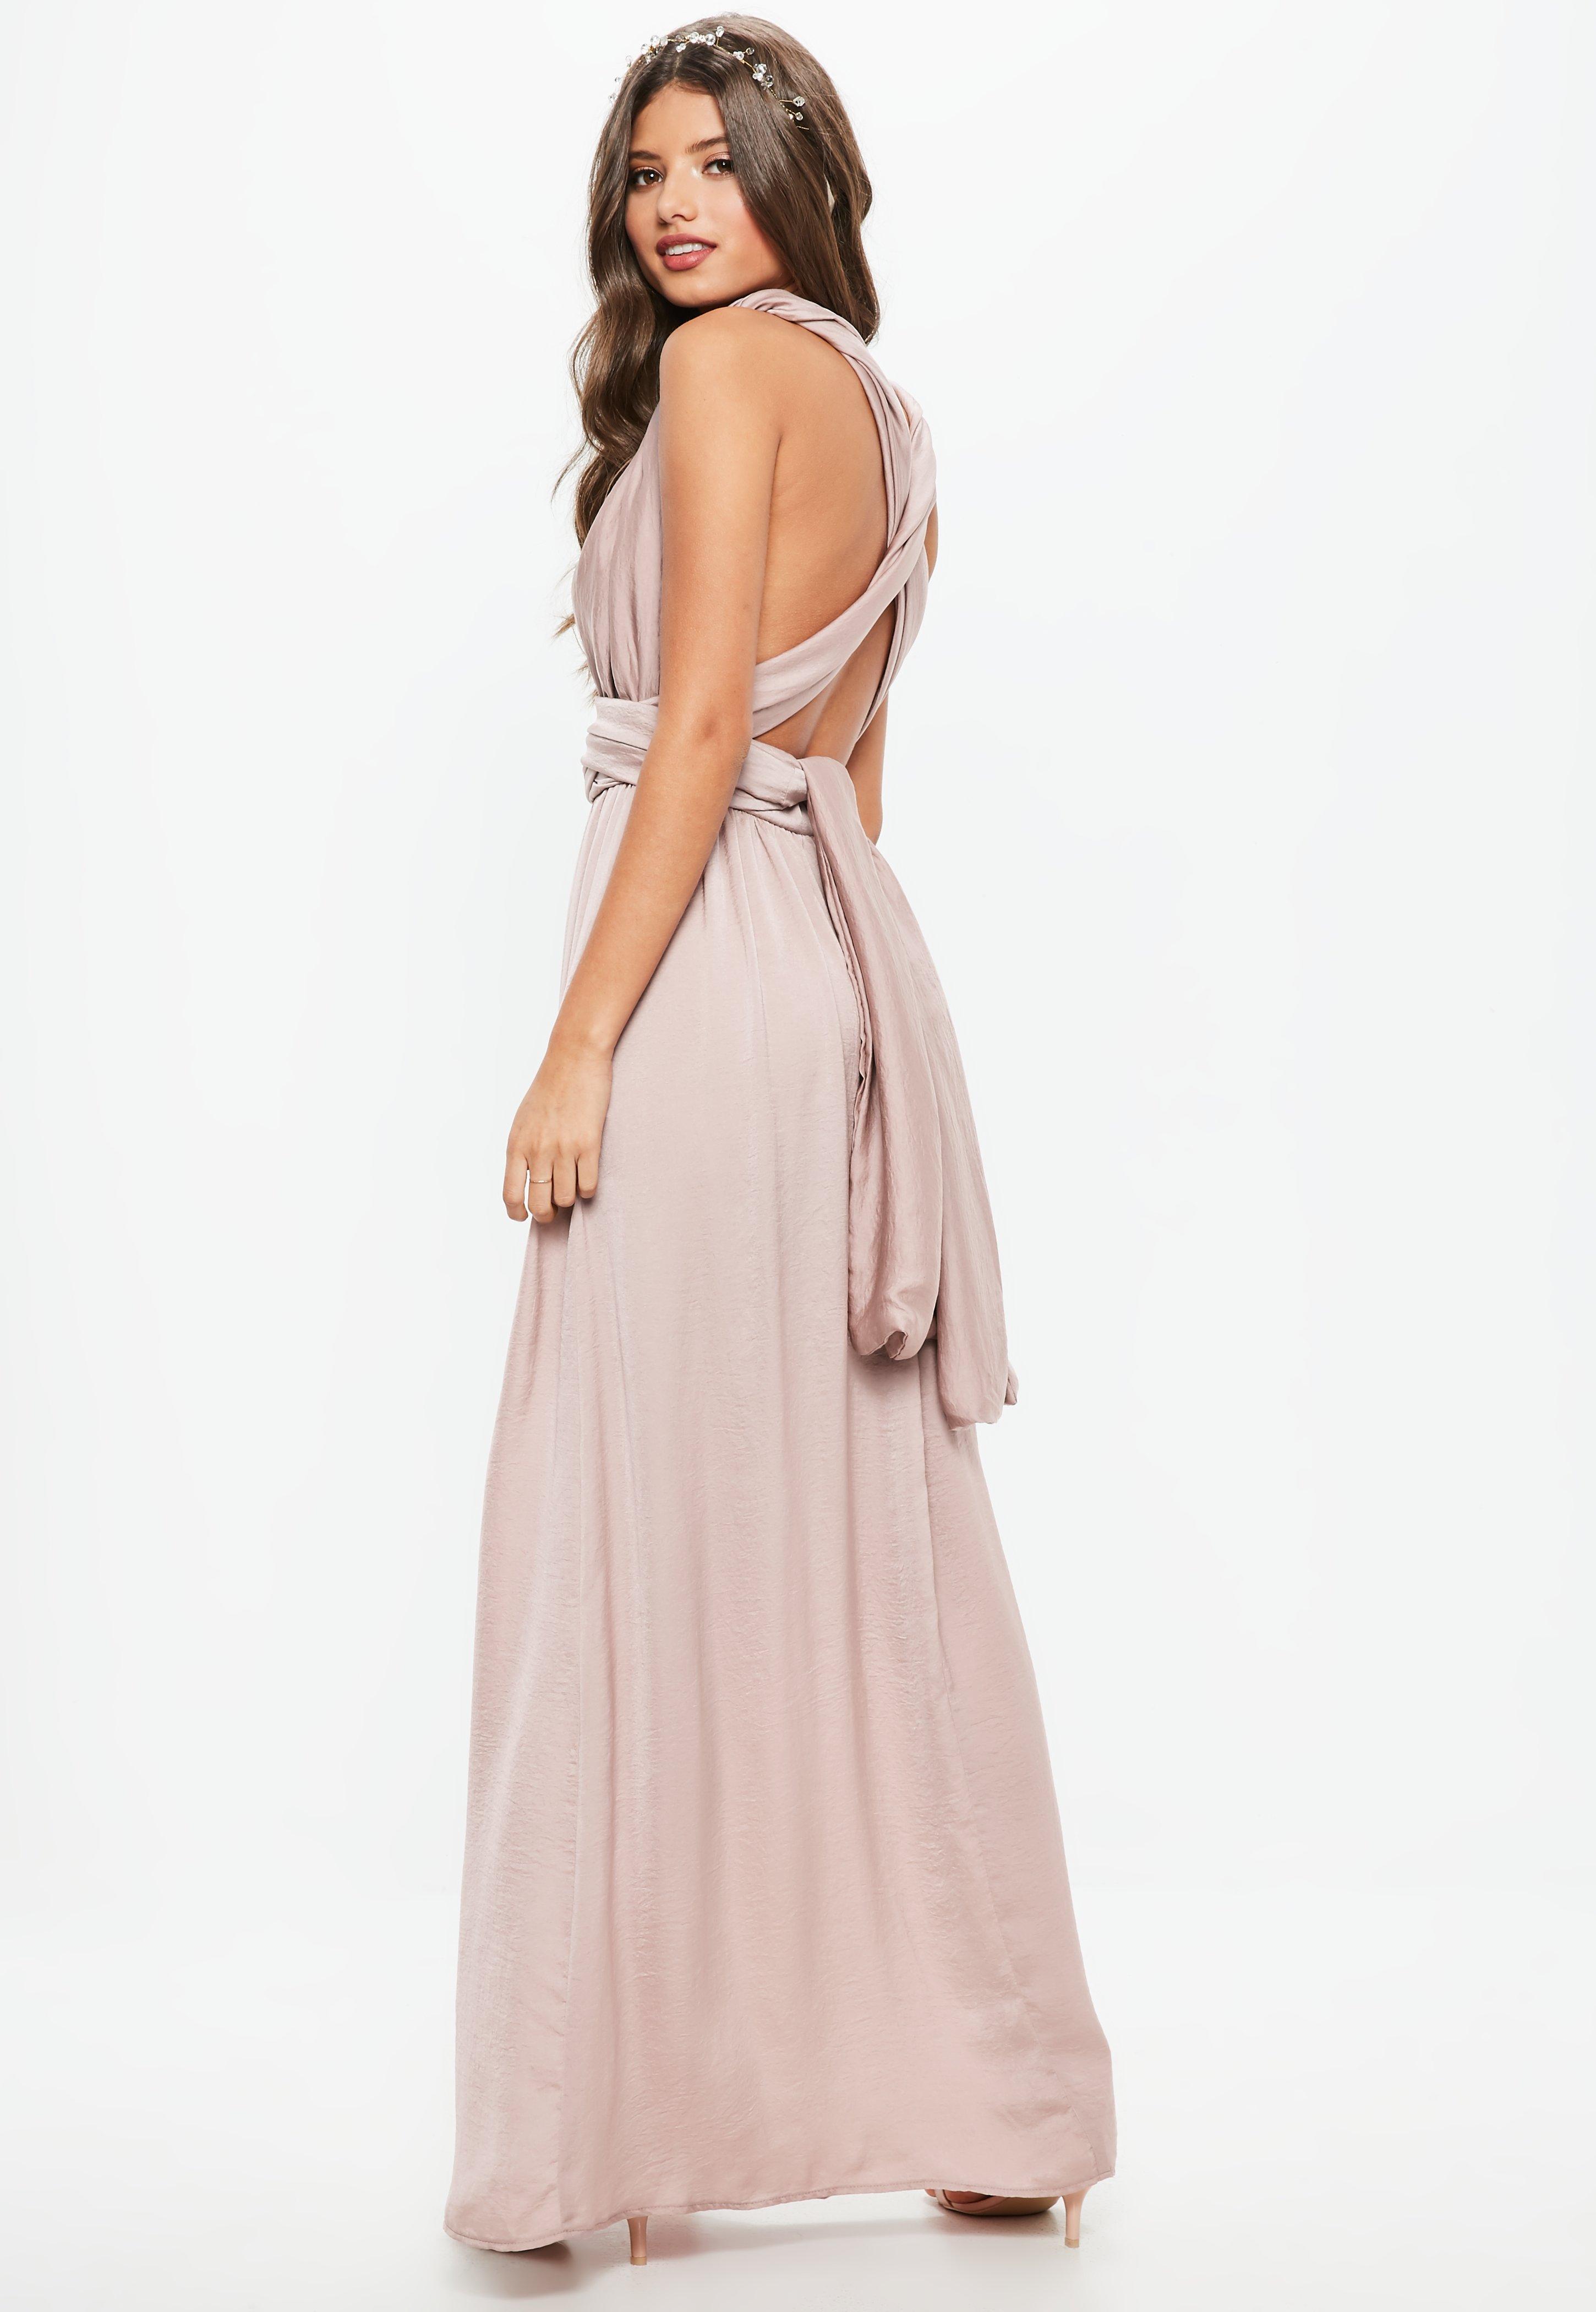 a036d27758f Gallery. Women s Bridesmaid Dresses Women s Pink Dresses Women s Ruffle Maxi  ...